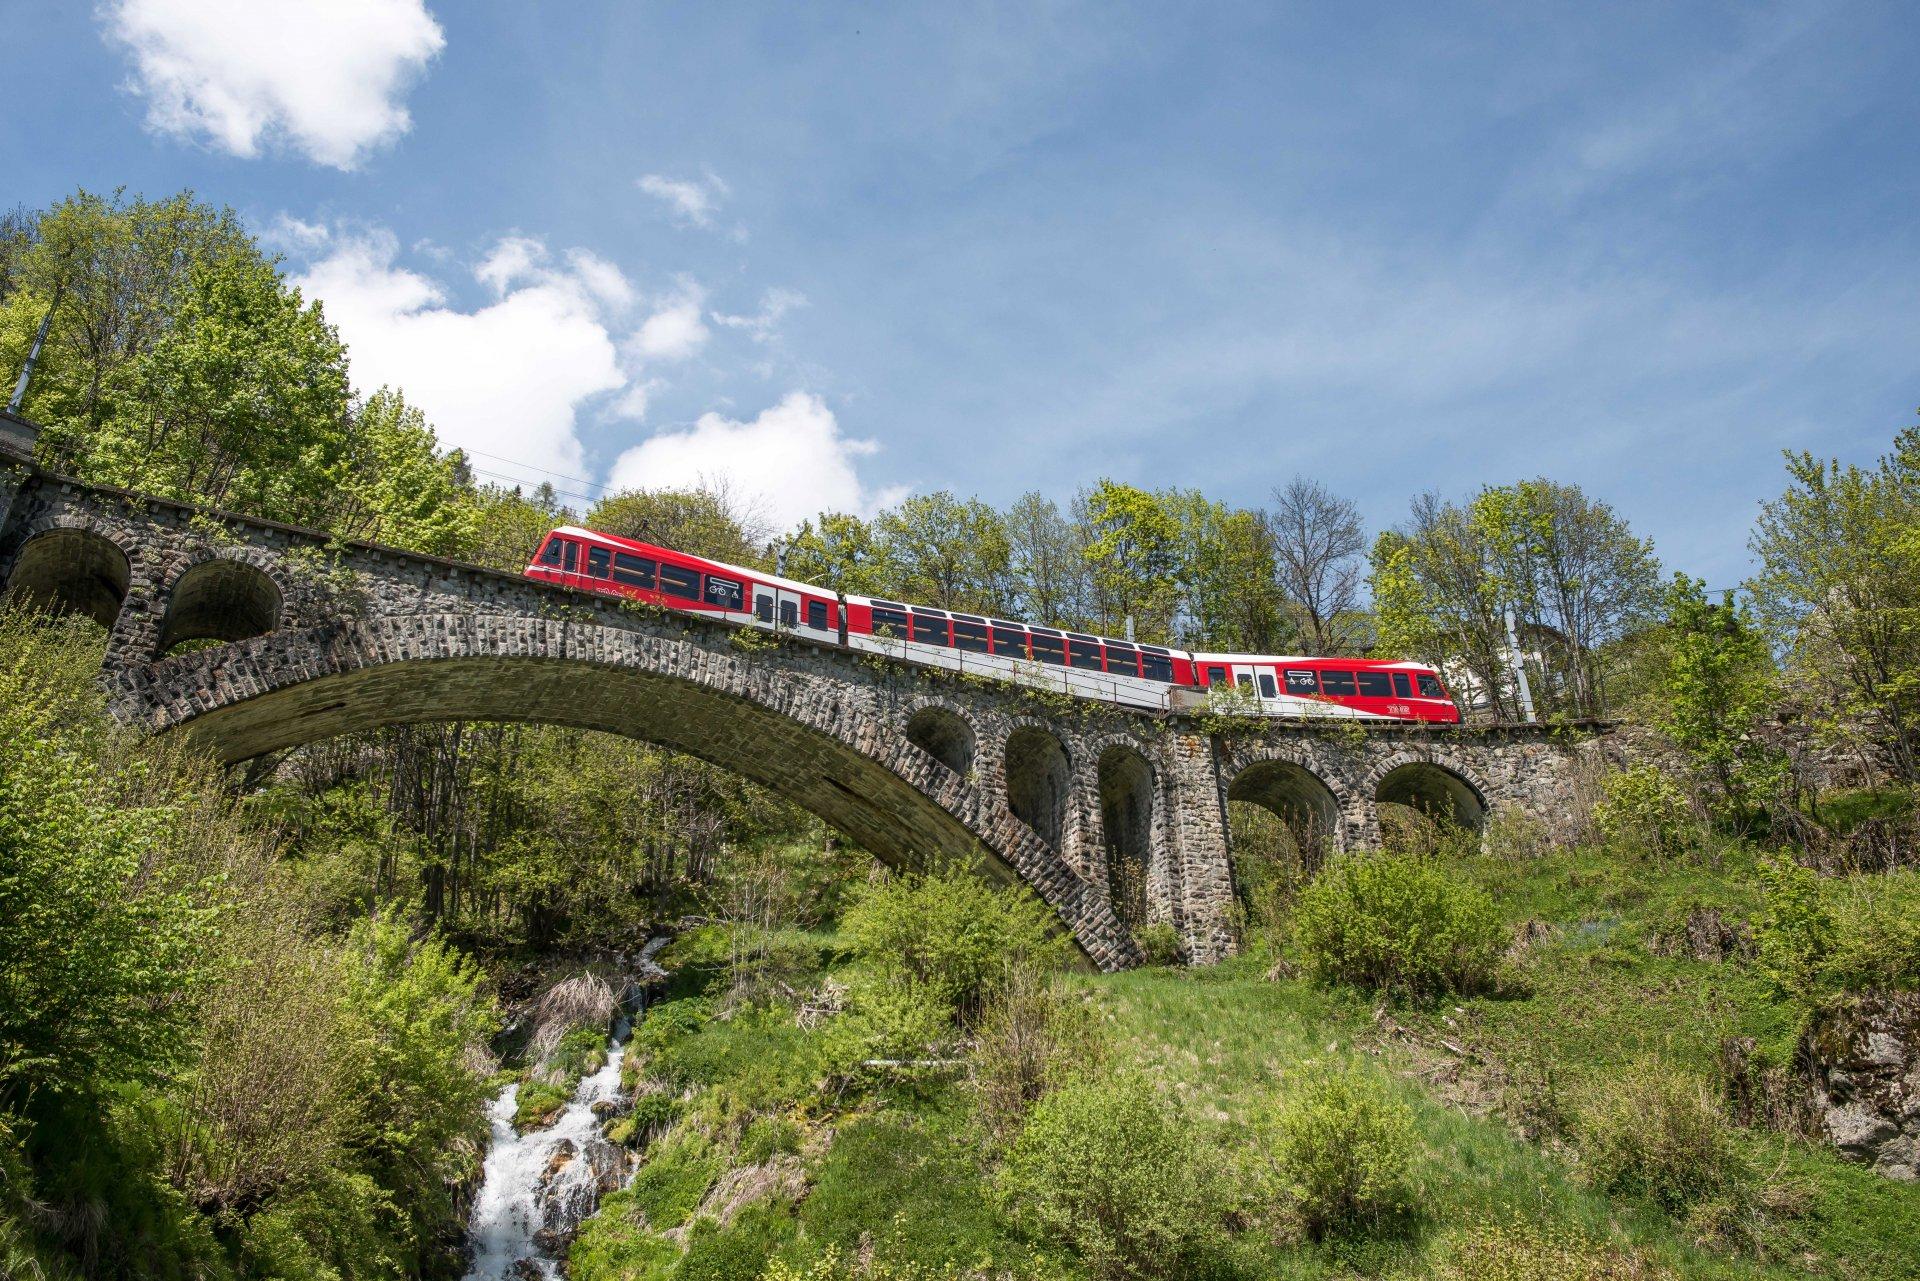 /UserFiles/File/Annuaire/annuaire_portails/Mont/Mont-Blanc-express-sur-Pont-2-small.jpg